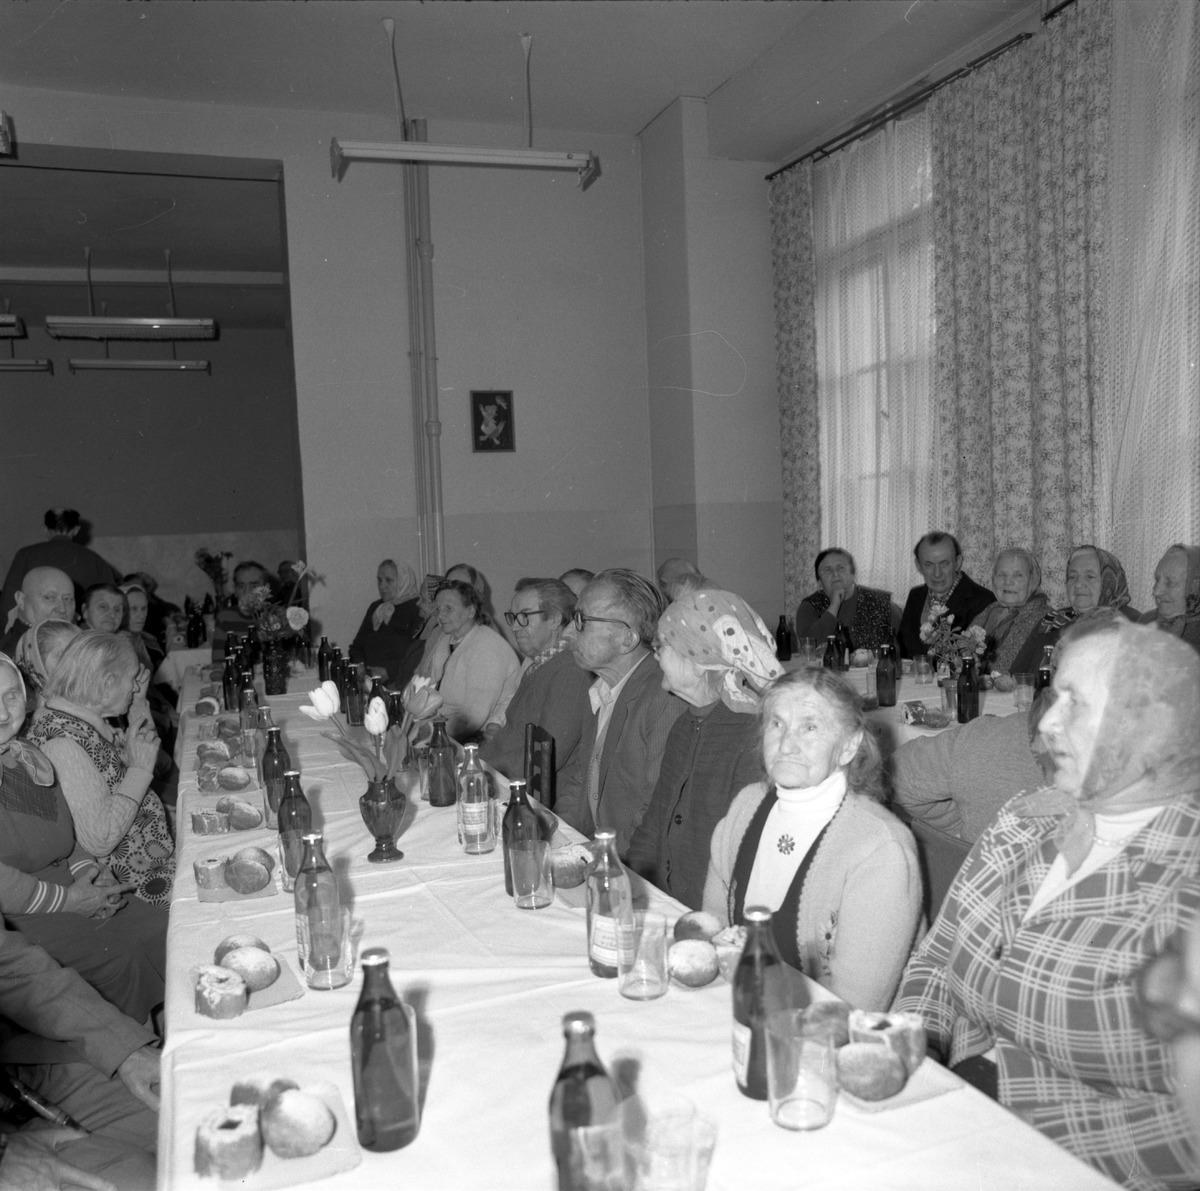 Obchody Dnia Seniora, 1985 r. [2]